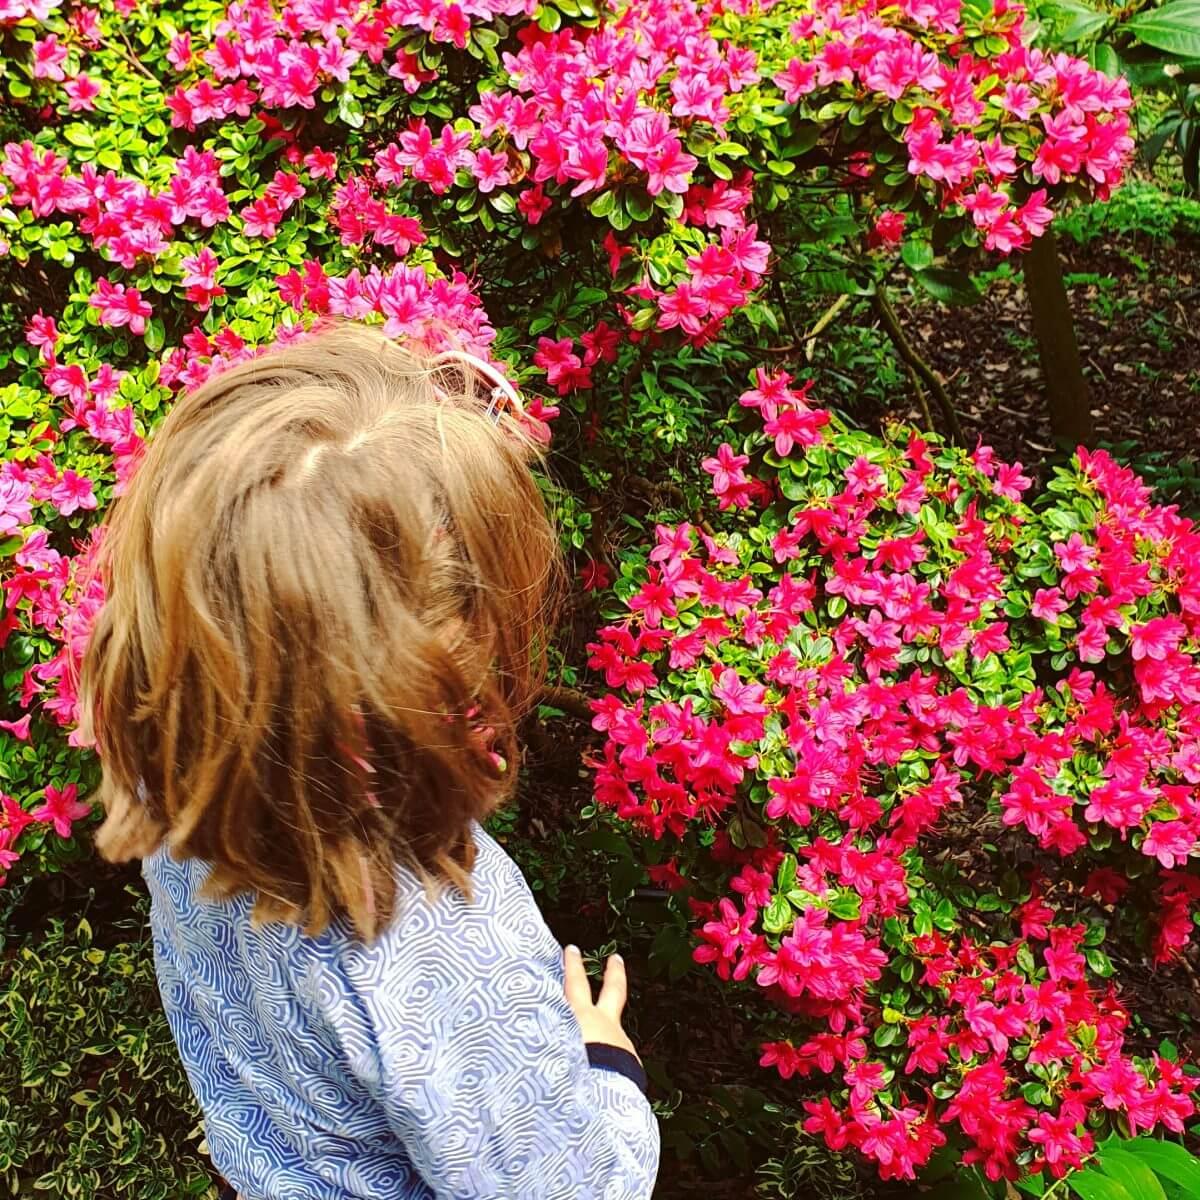 Bloemen in de Hortus Botanicus